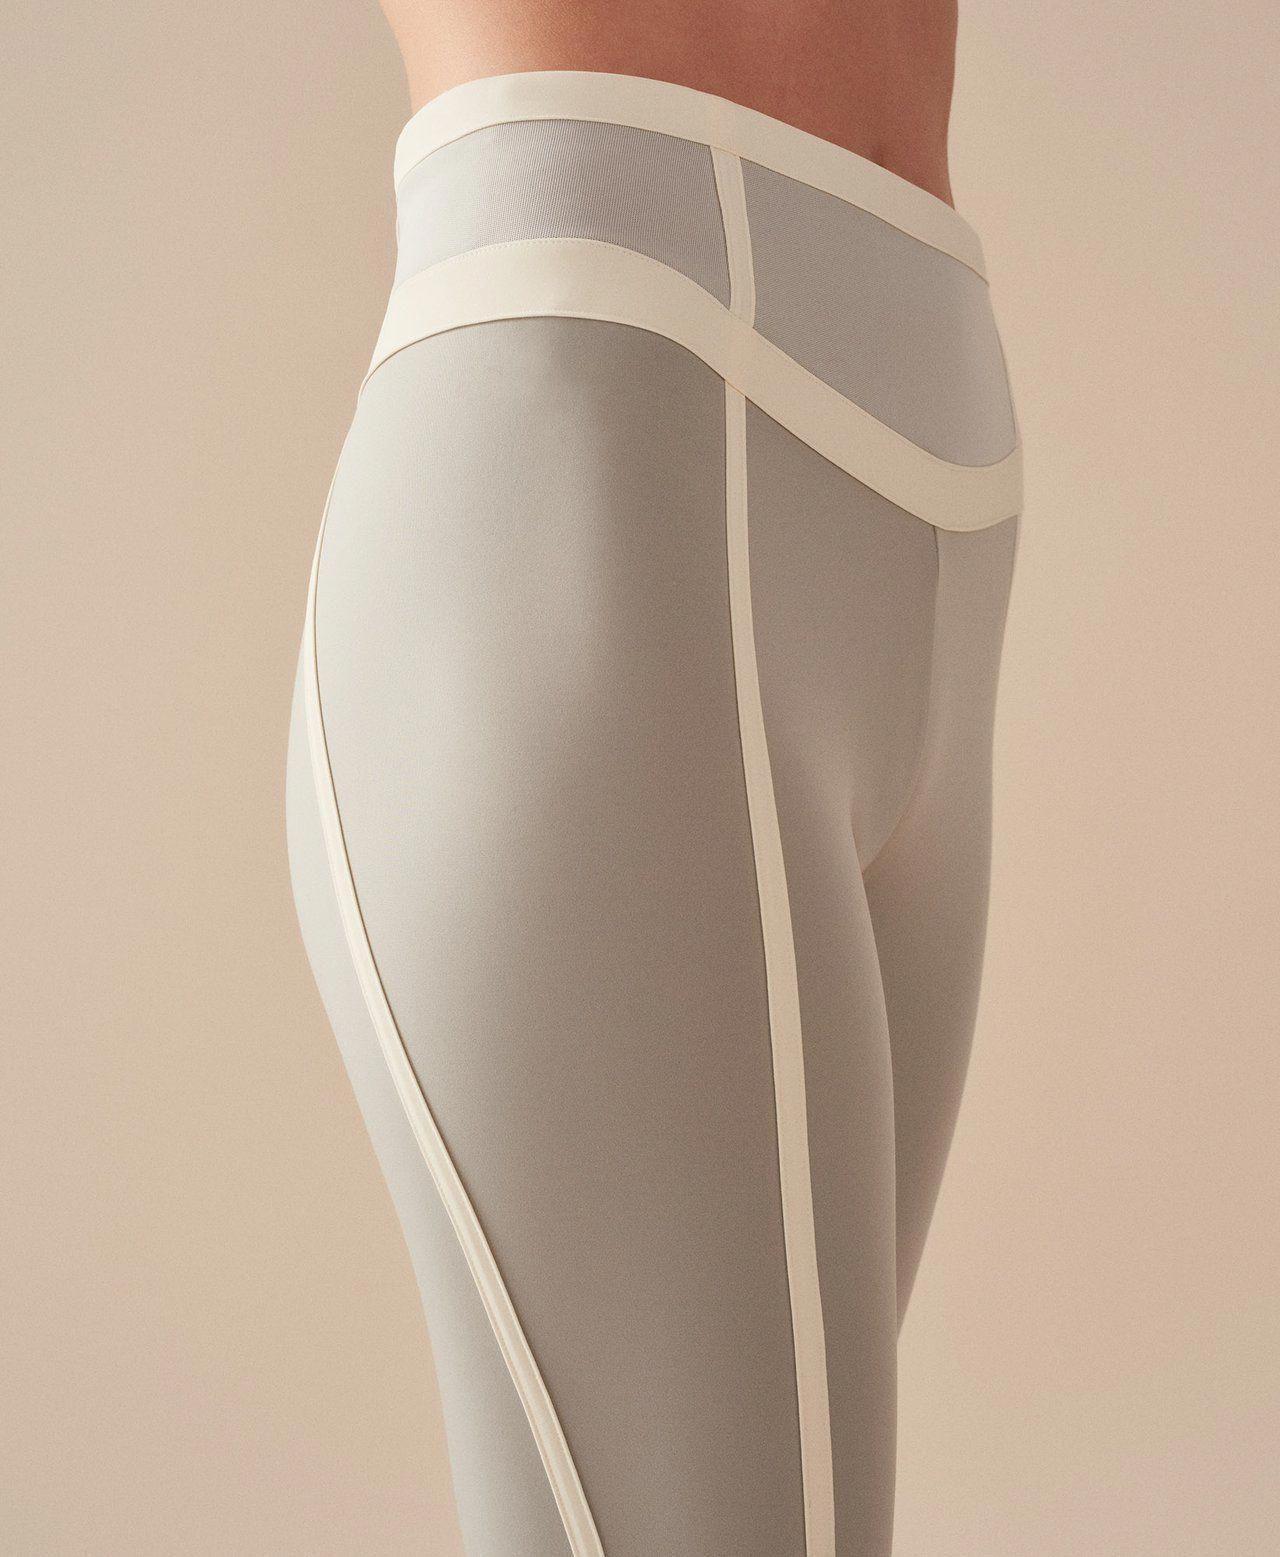 leggings leggings (met afbeeldingen)